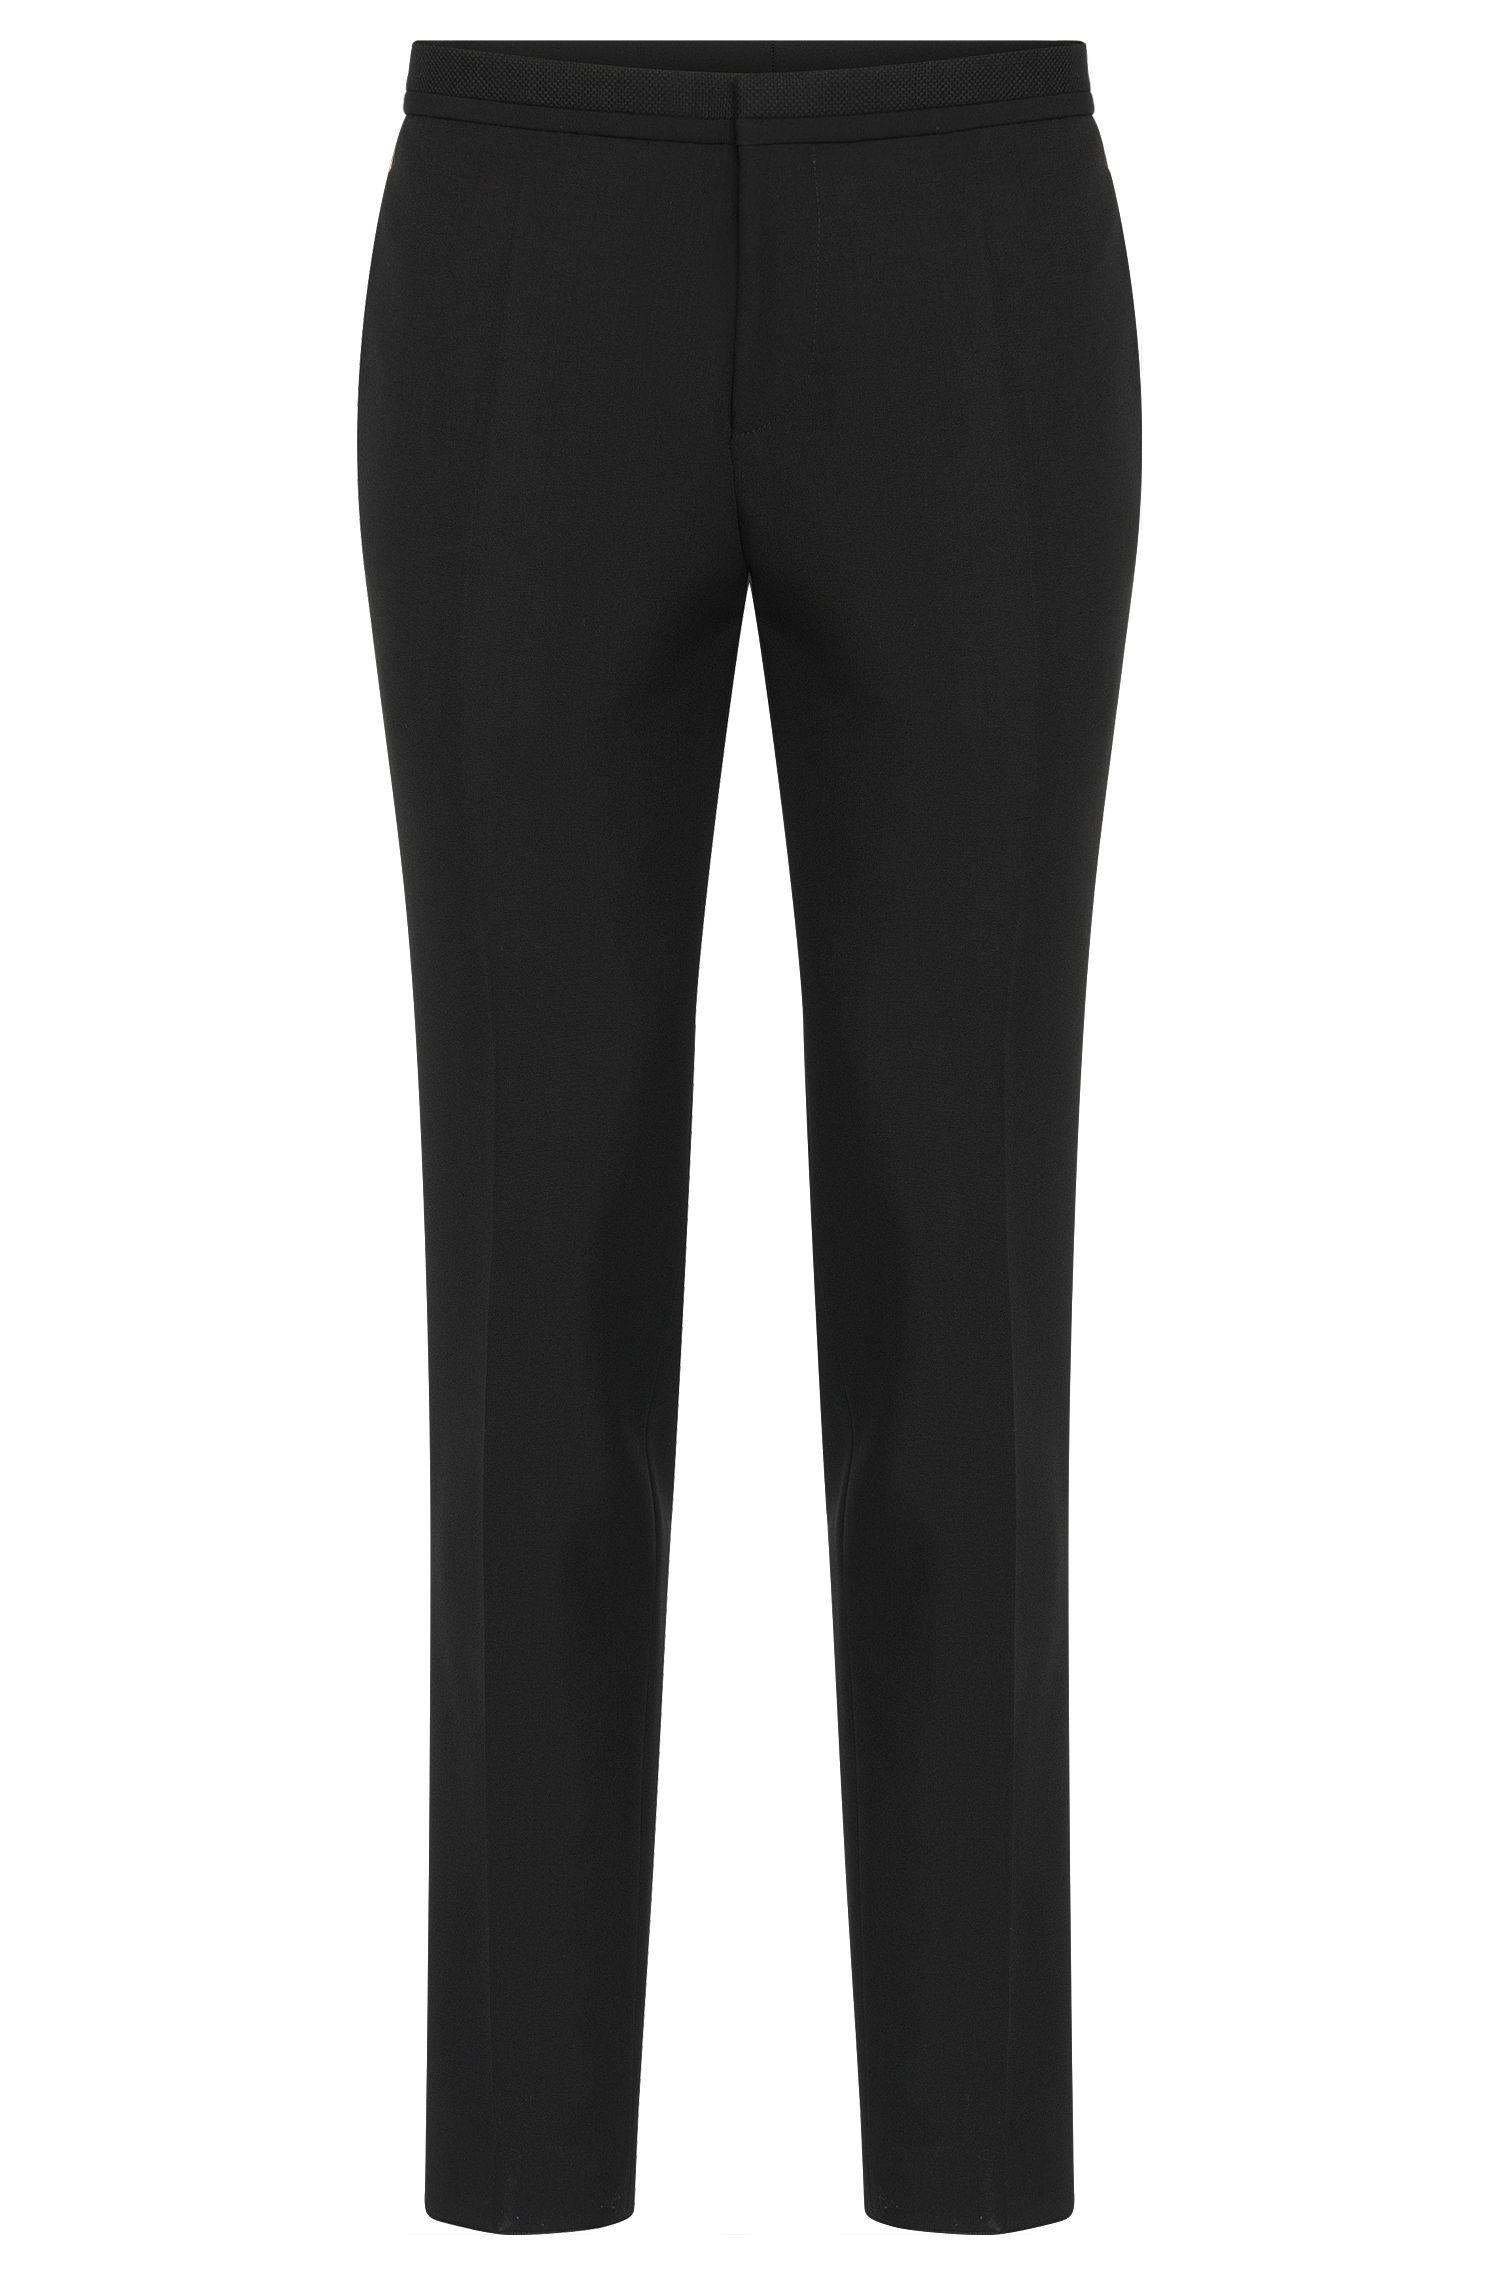 Virgin Wool Mohair Dress Pants, Extra Slim Fit   Wynn